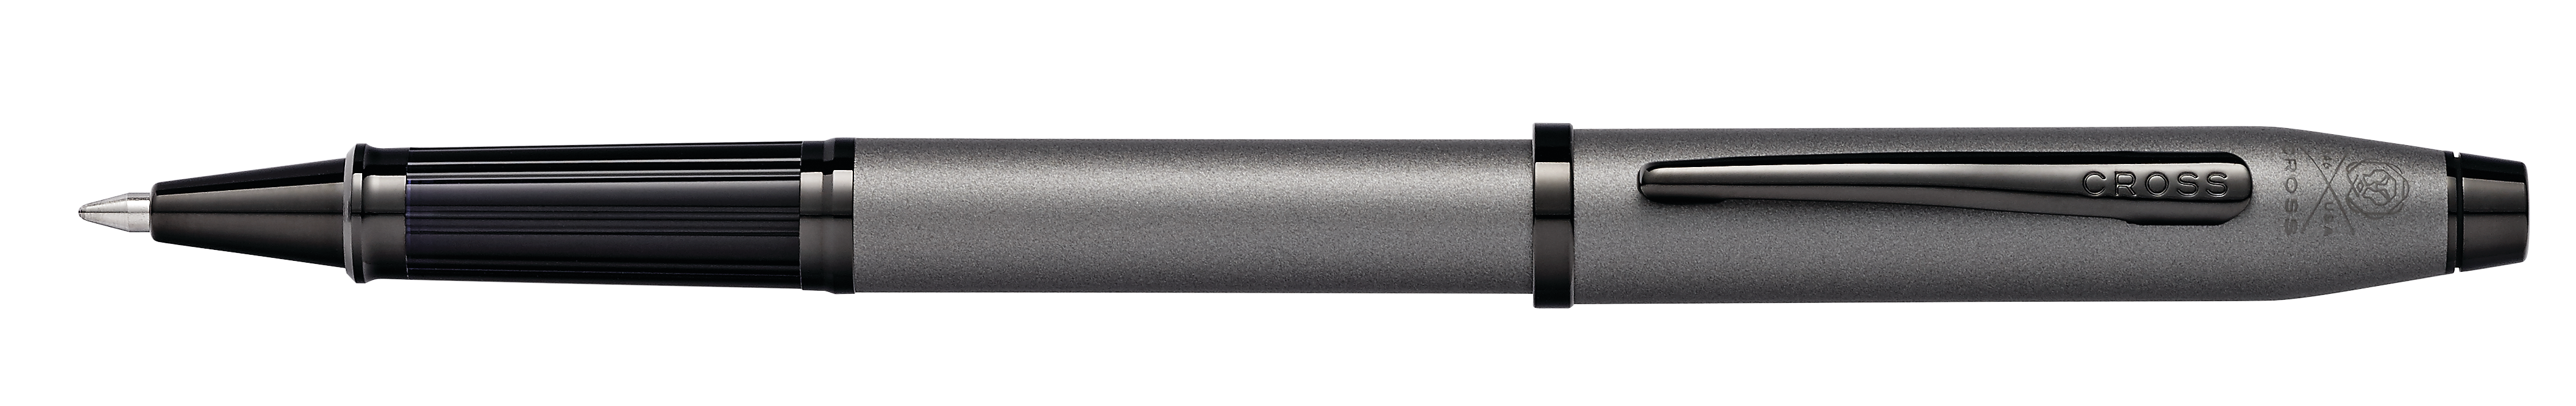 Century II Gunmetal Gray Rollerball Pen